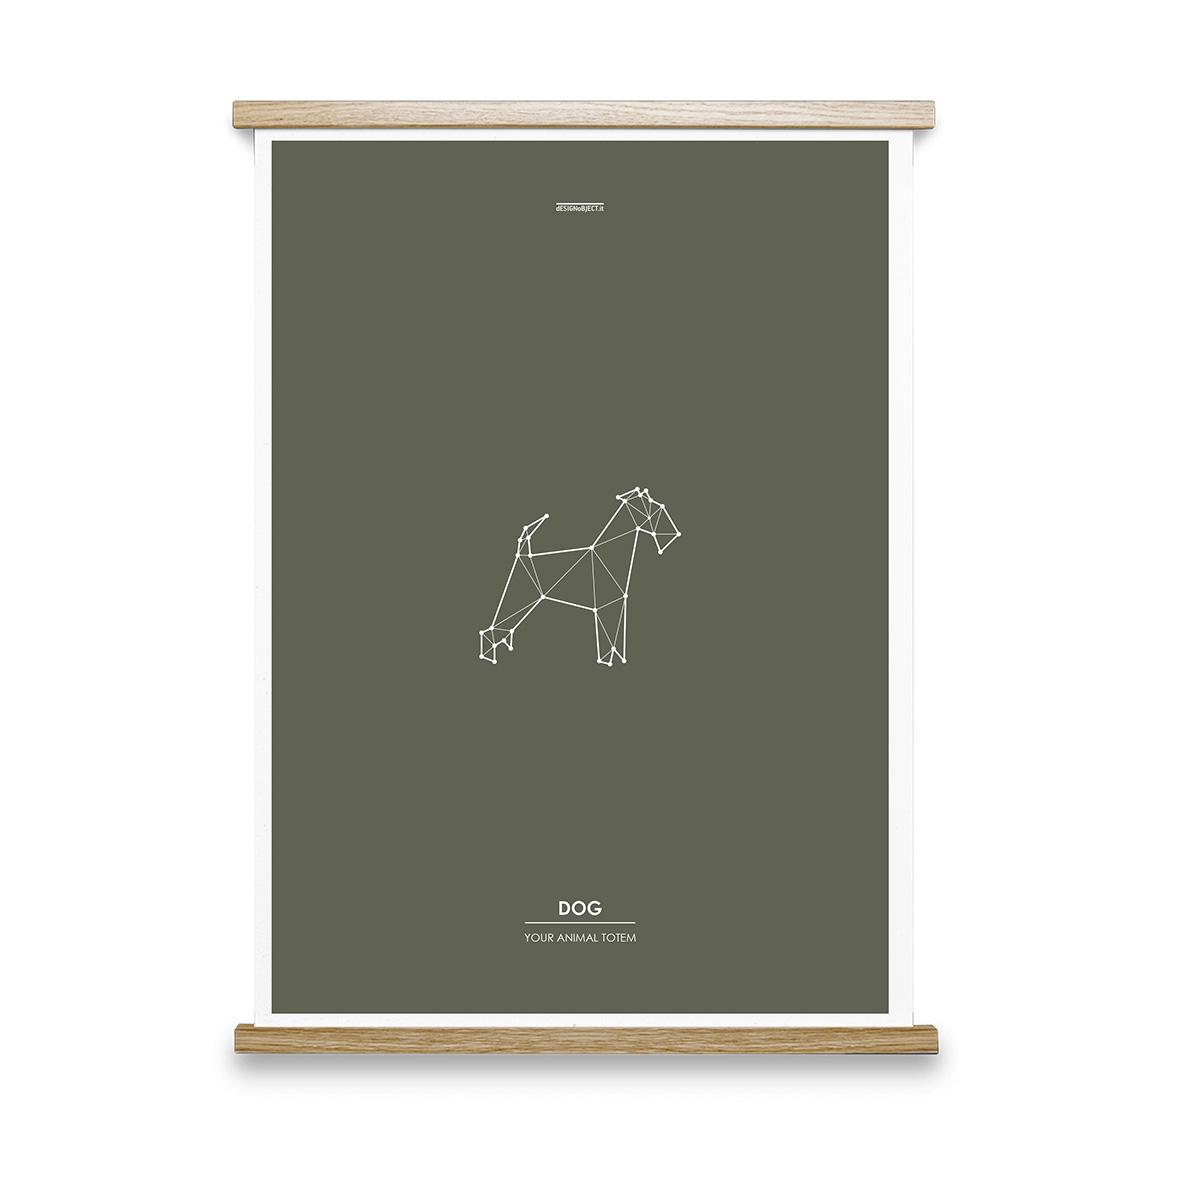 dog-animal-totem-art-print